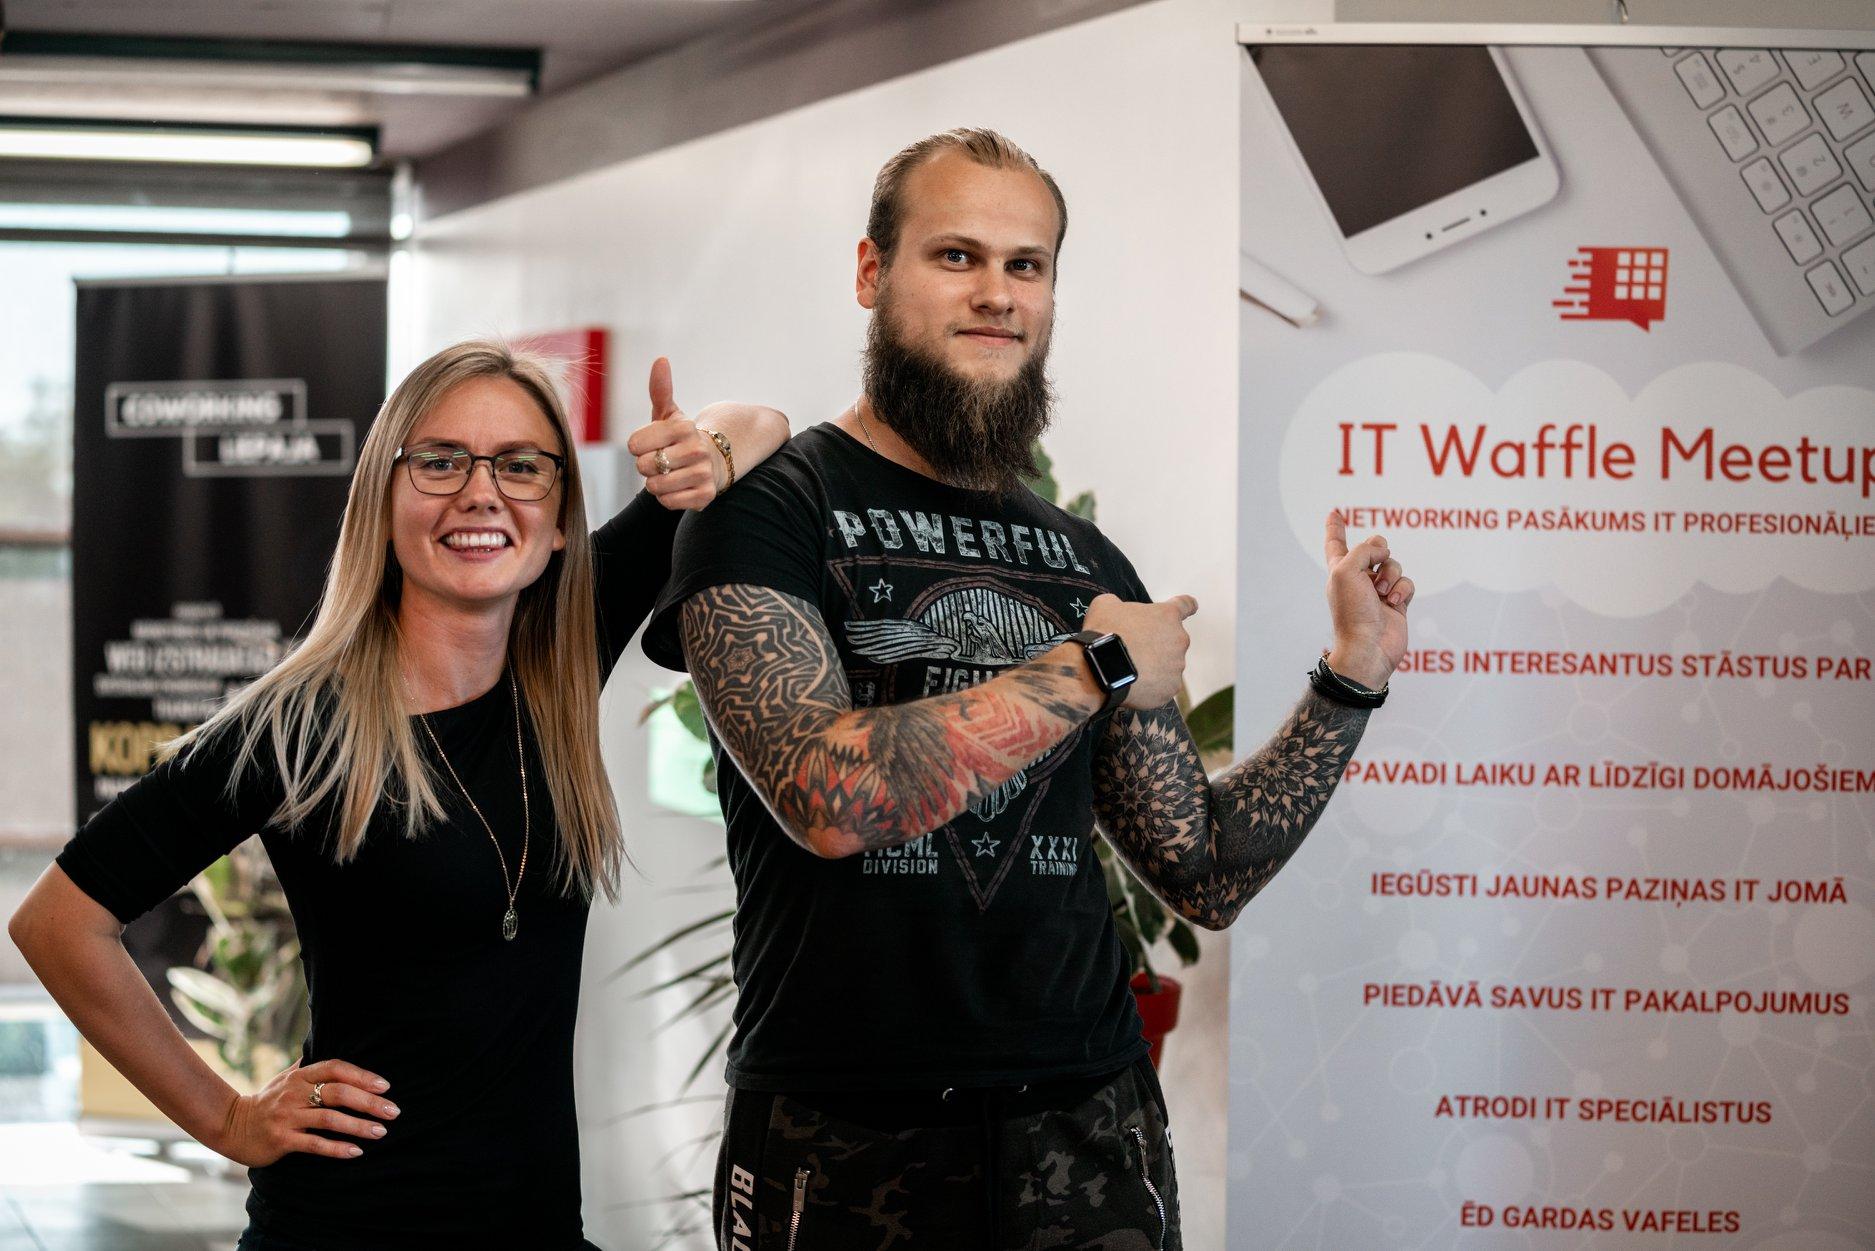 Yan Tsishko and Agate Ambulte in IT Waffle Meetup